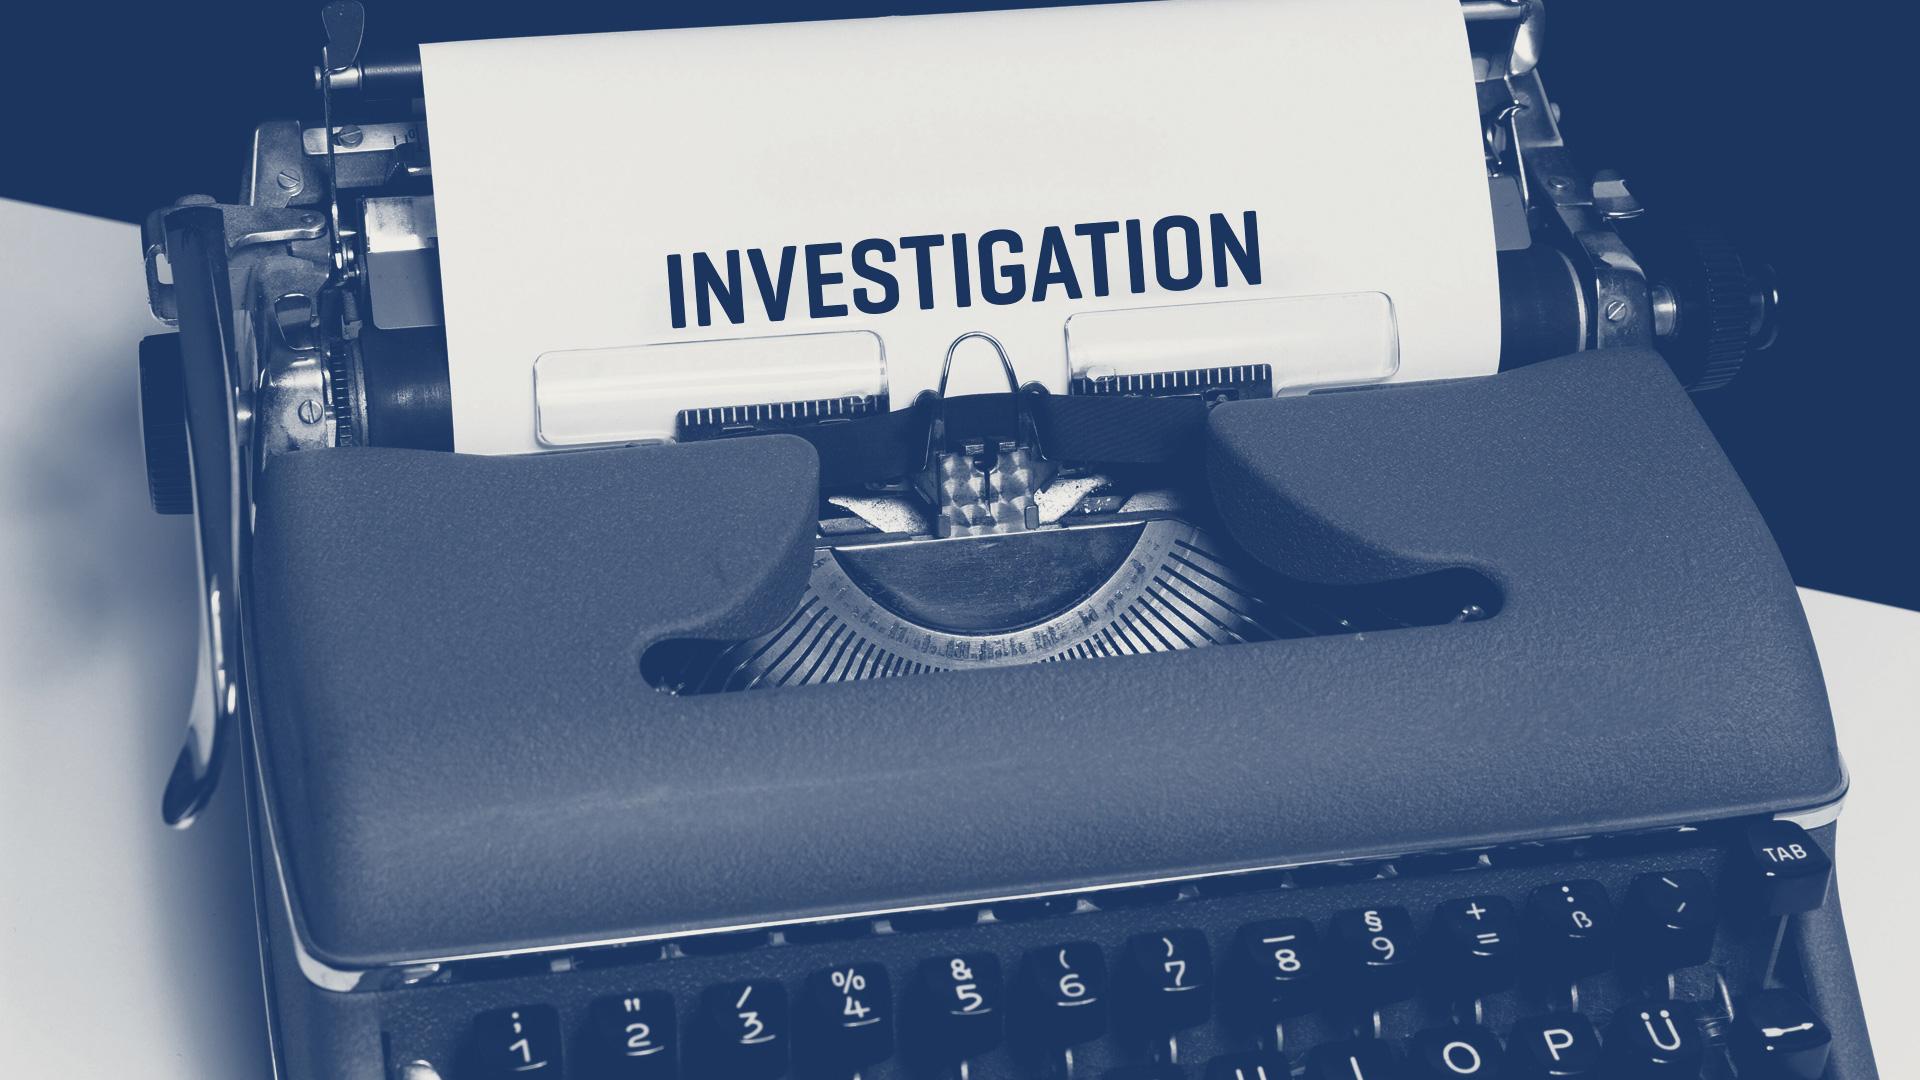 Smarter compliance surveillance starts here